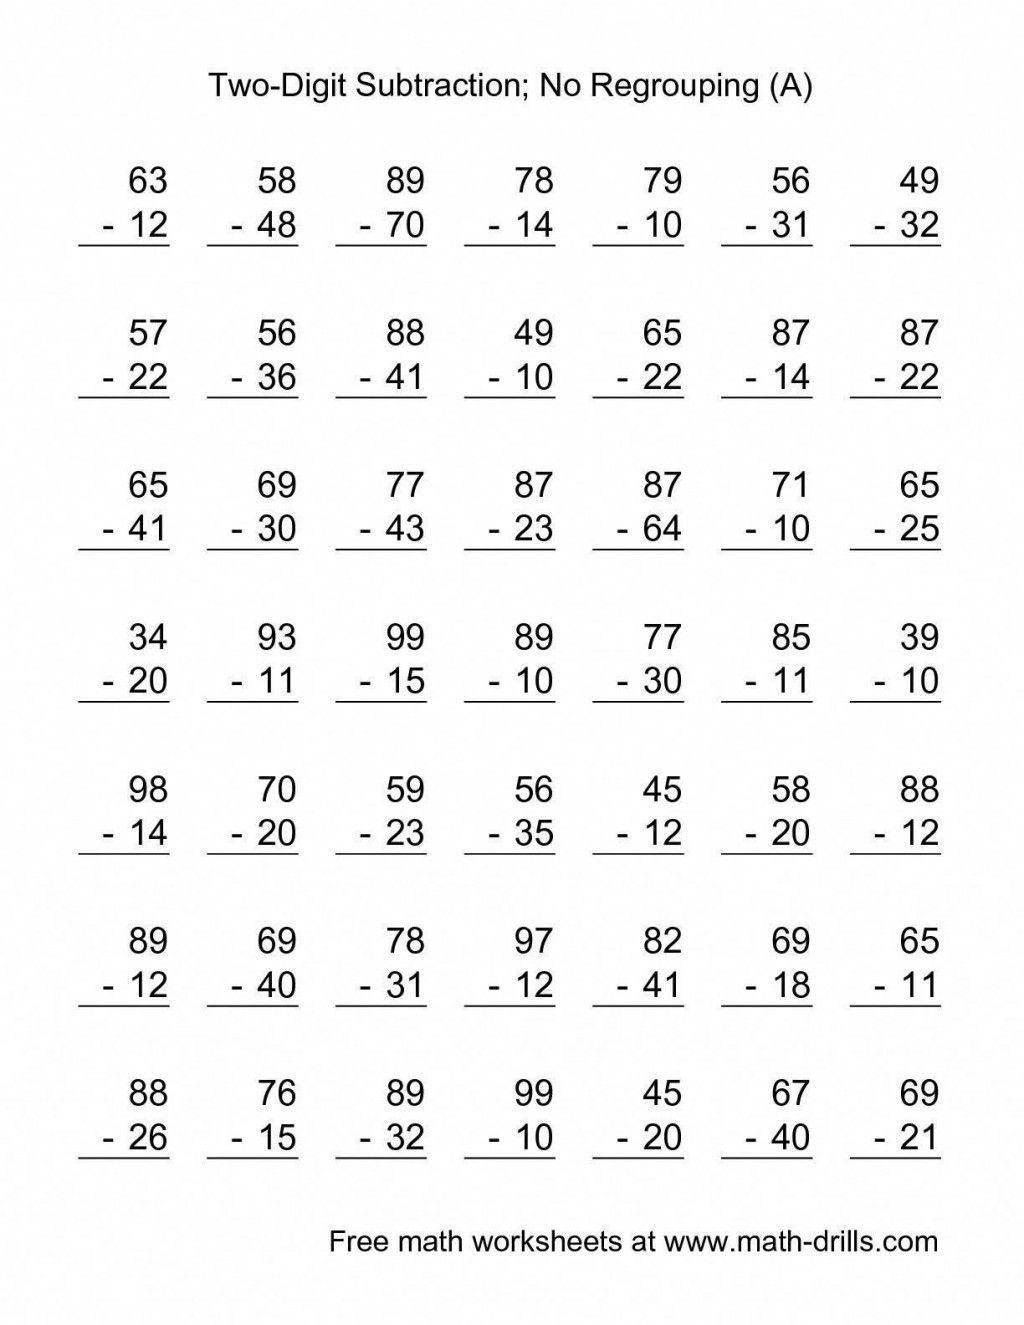 4 Worksheet Free Math Worksheets First Grade 1 Addition Add In Columns 2  Dig…   2nd grade math worksheets [ 1325 x 1024 Pixel ]